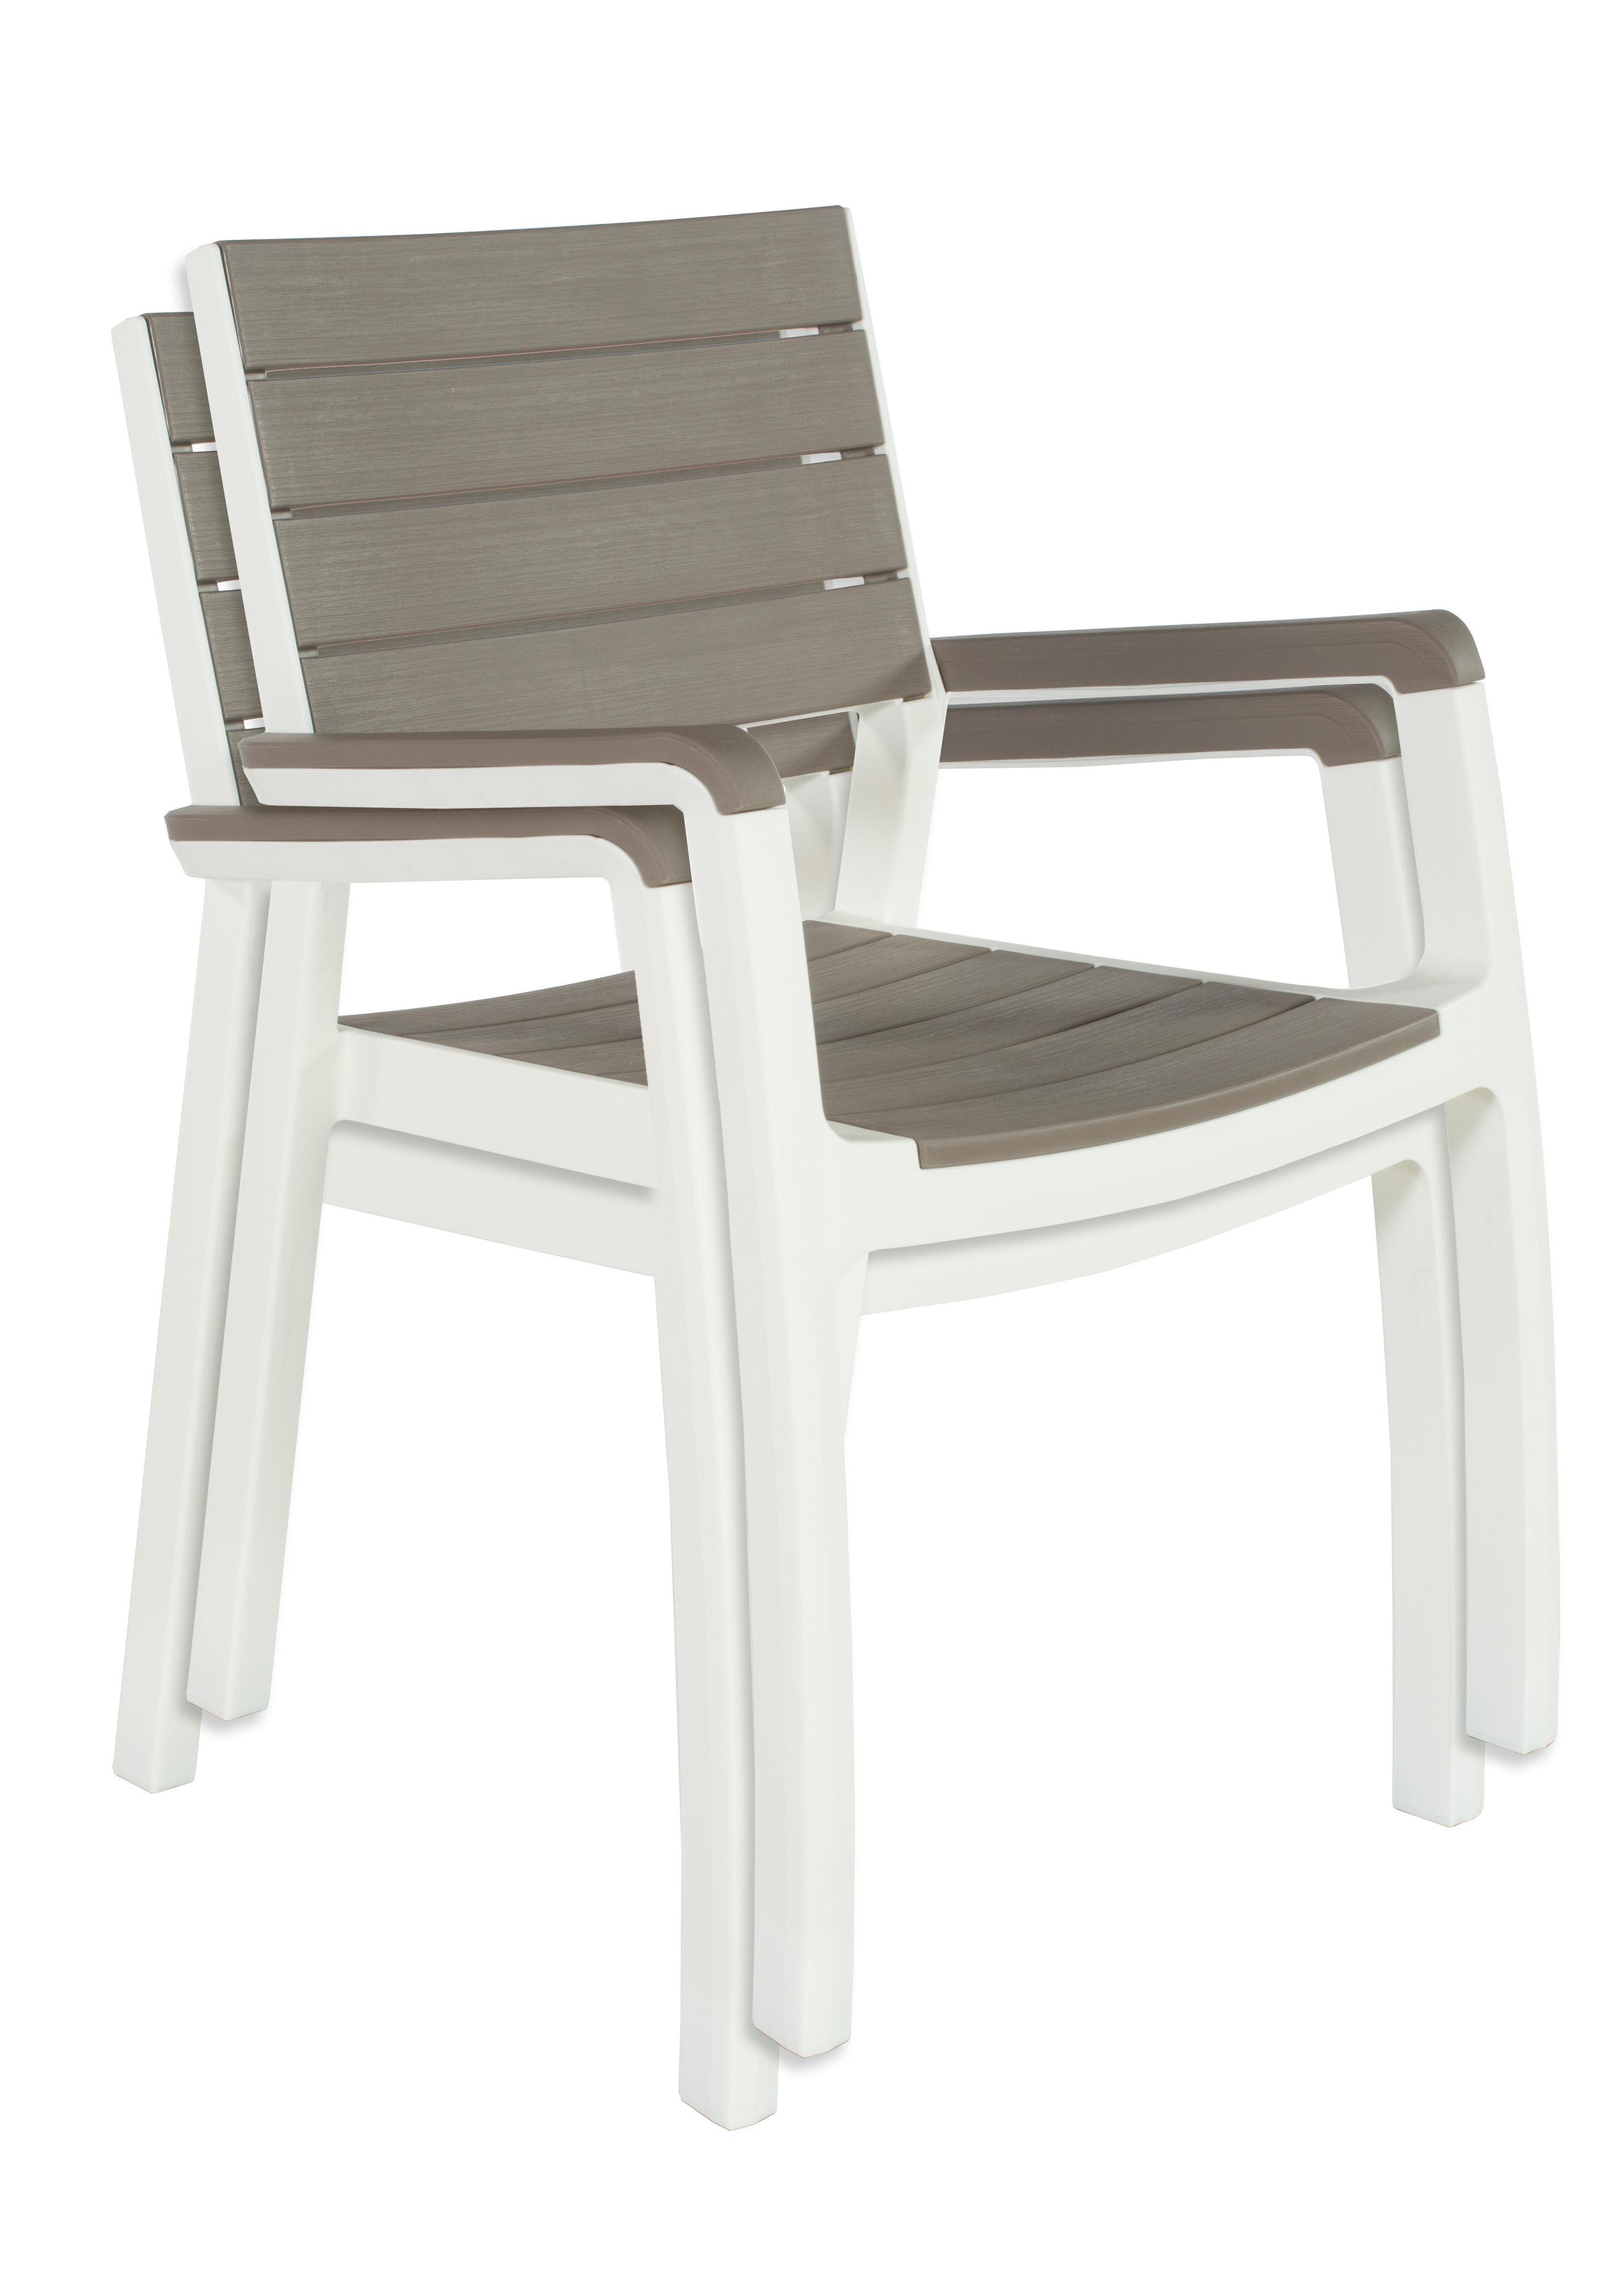 4 Chair Patio Set: Amazon.com : Keter Harmony Indoor/Outdoor Stackable Patio